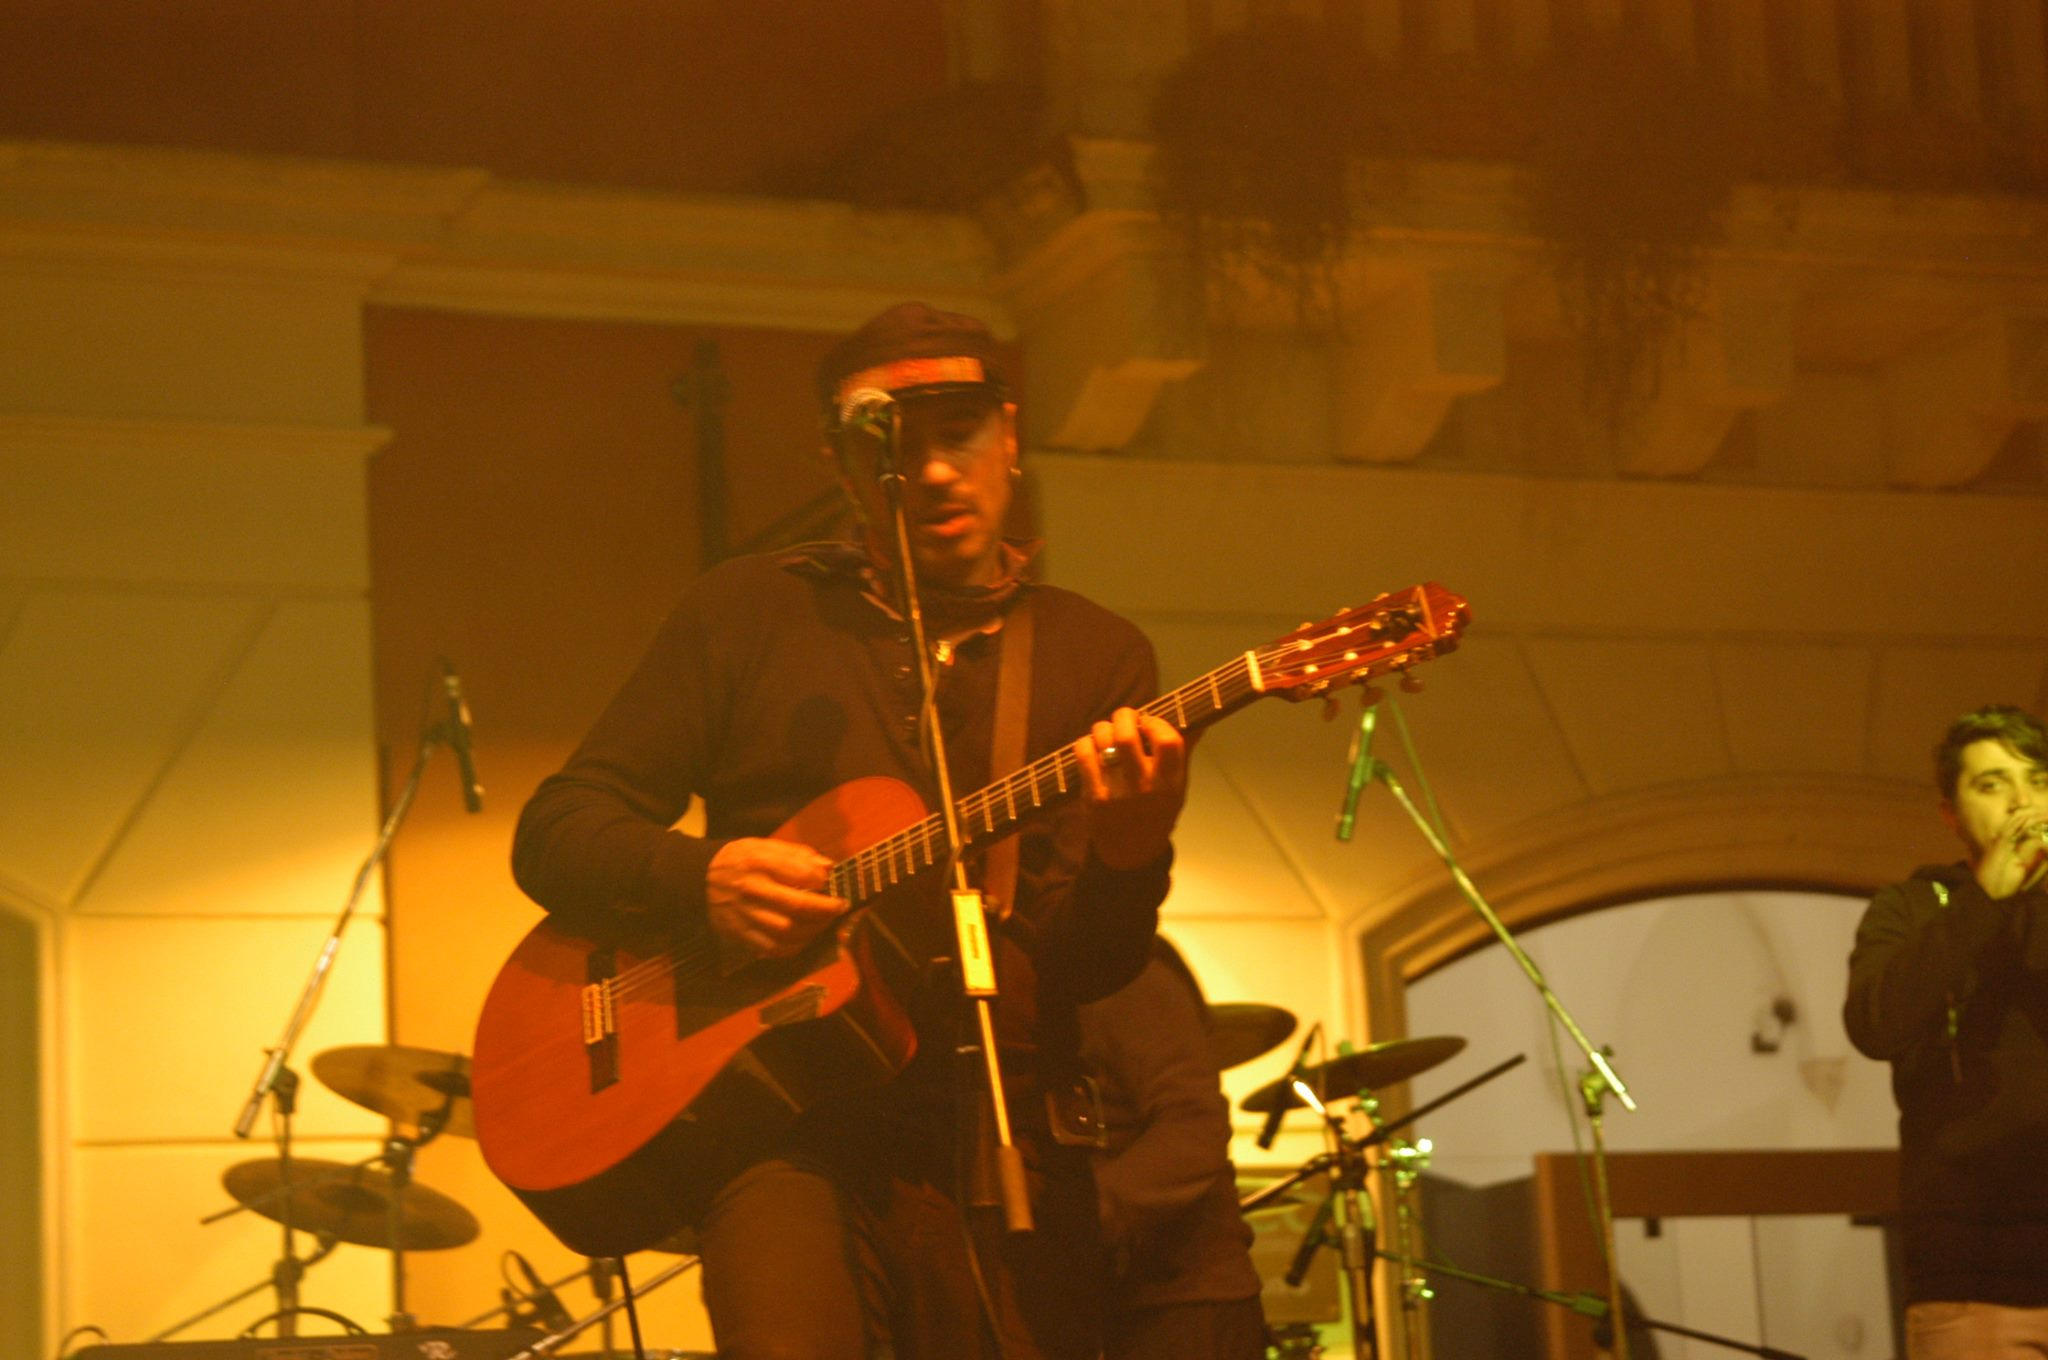 Luca Morino (Mau Mau) wearing So MELLOW